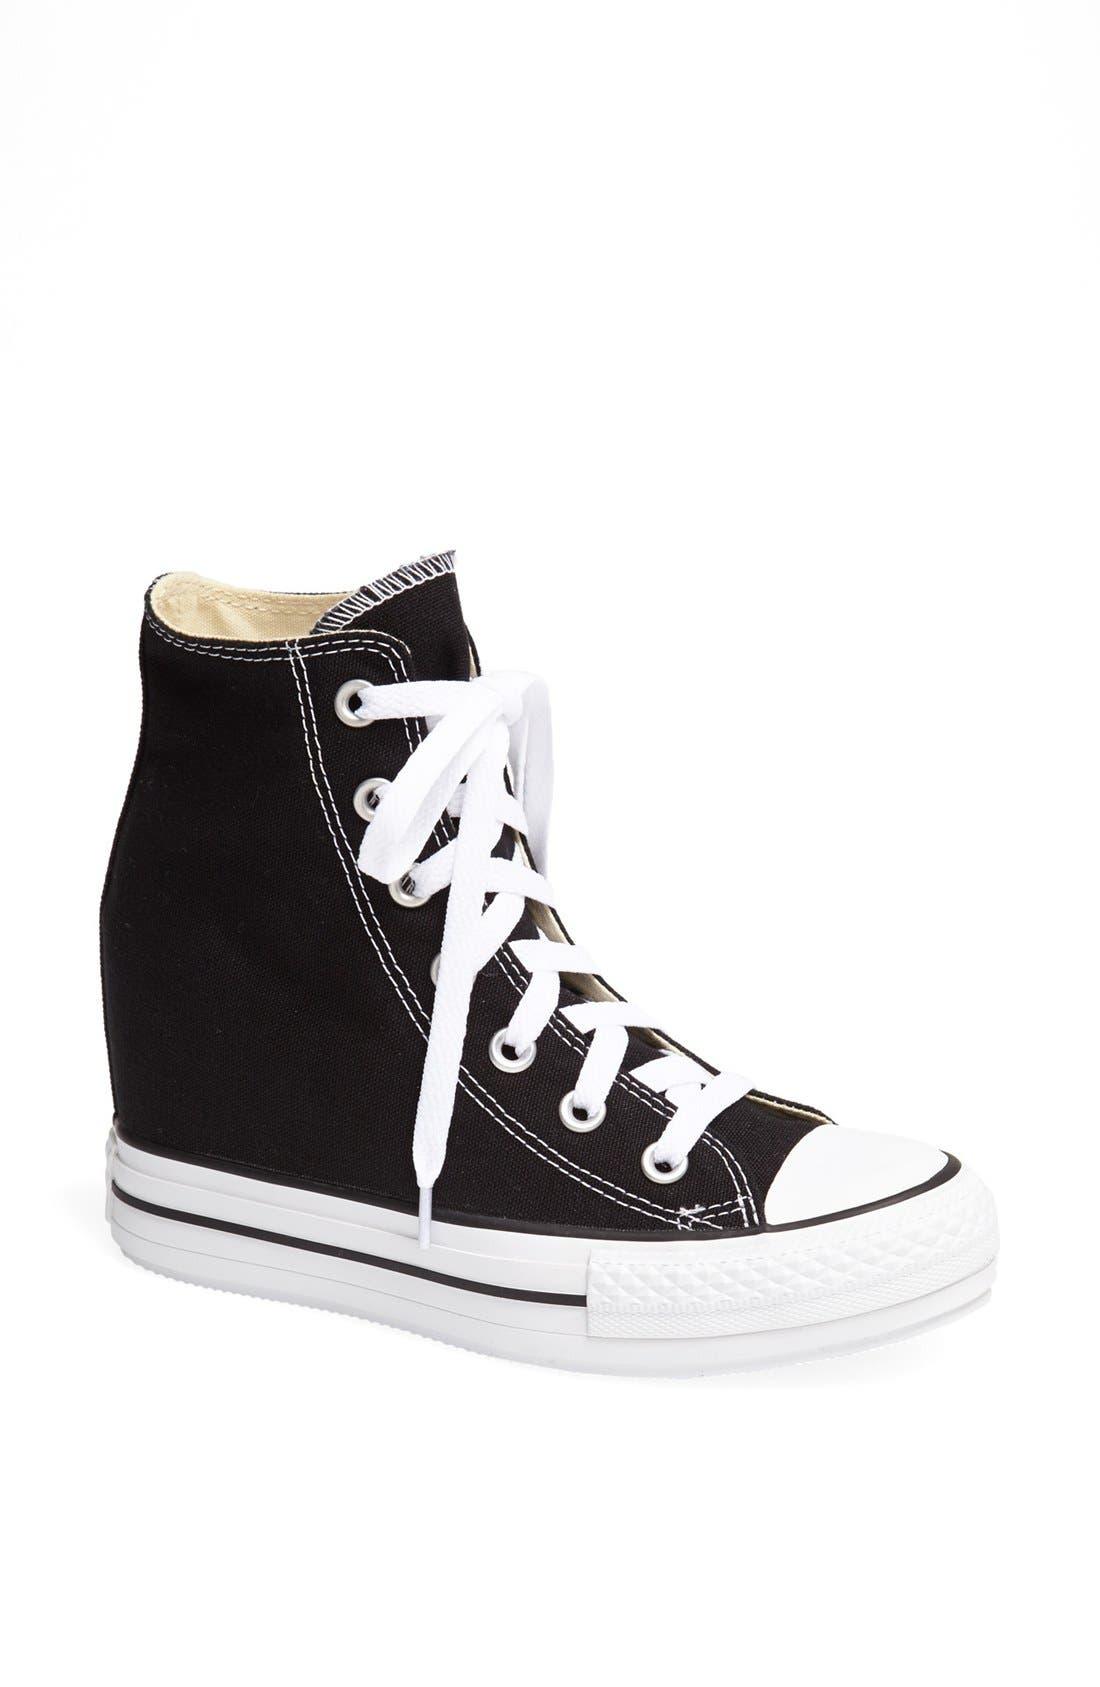 Chuck Taylor<sup>®</sup> All Star<sup>®</sup> Hidden Wedge Platform High-Top Sneaker,                             Main thumbnail 1, color,                             001